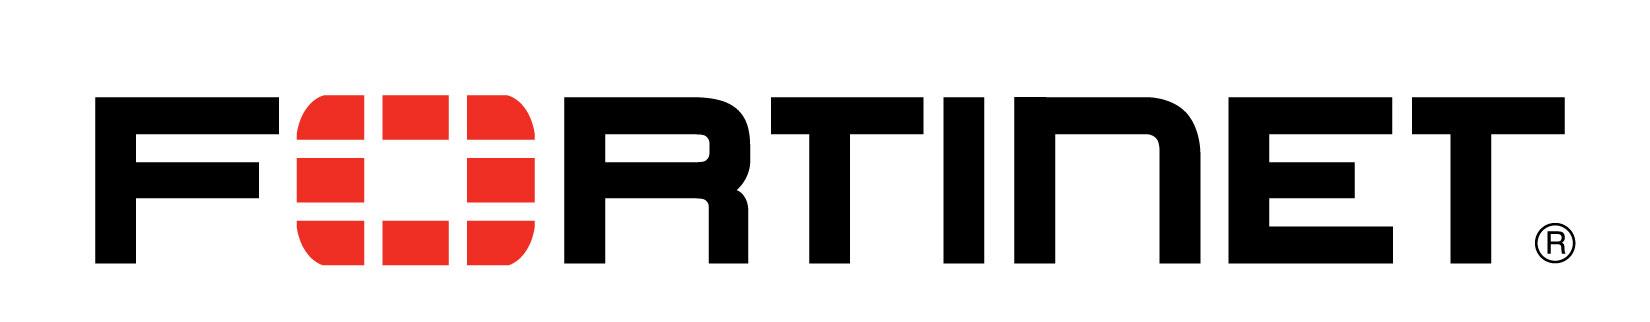 FortiGate Firewall Image